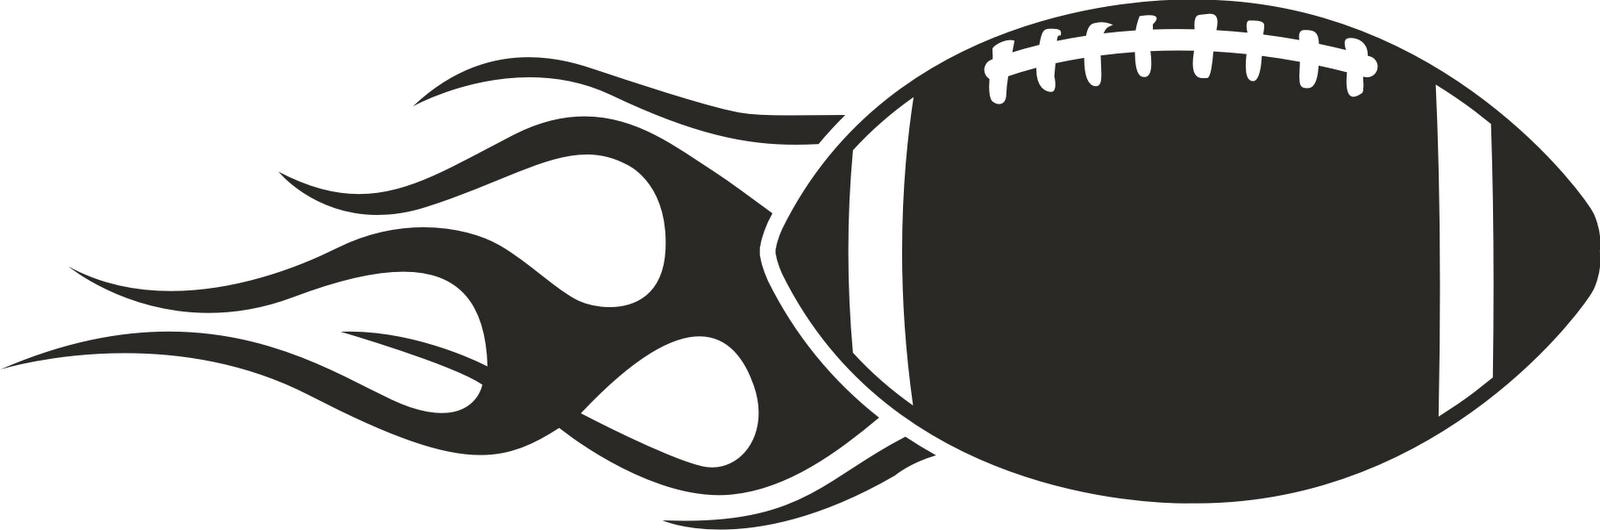 American Football Clipart & American Football Clip Art Images.